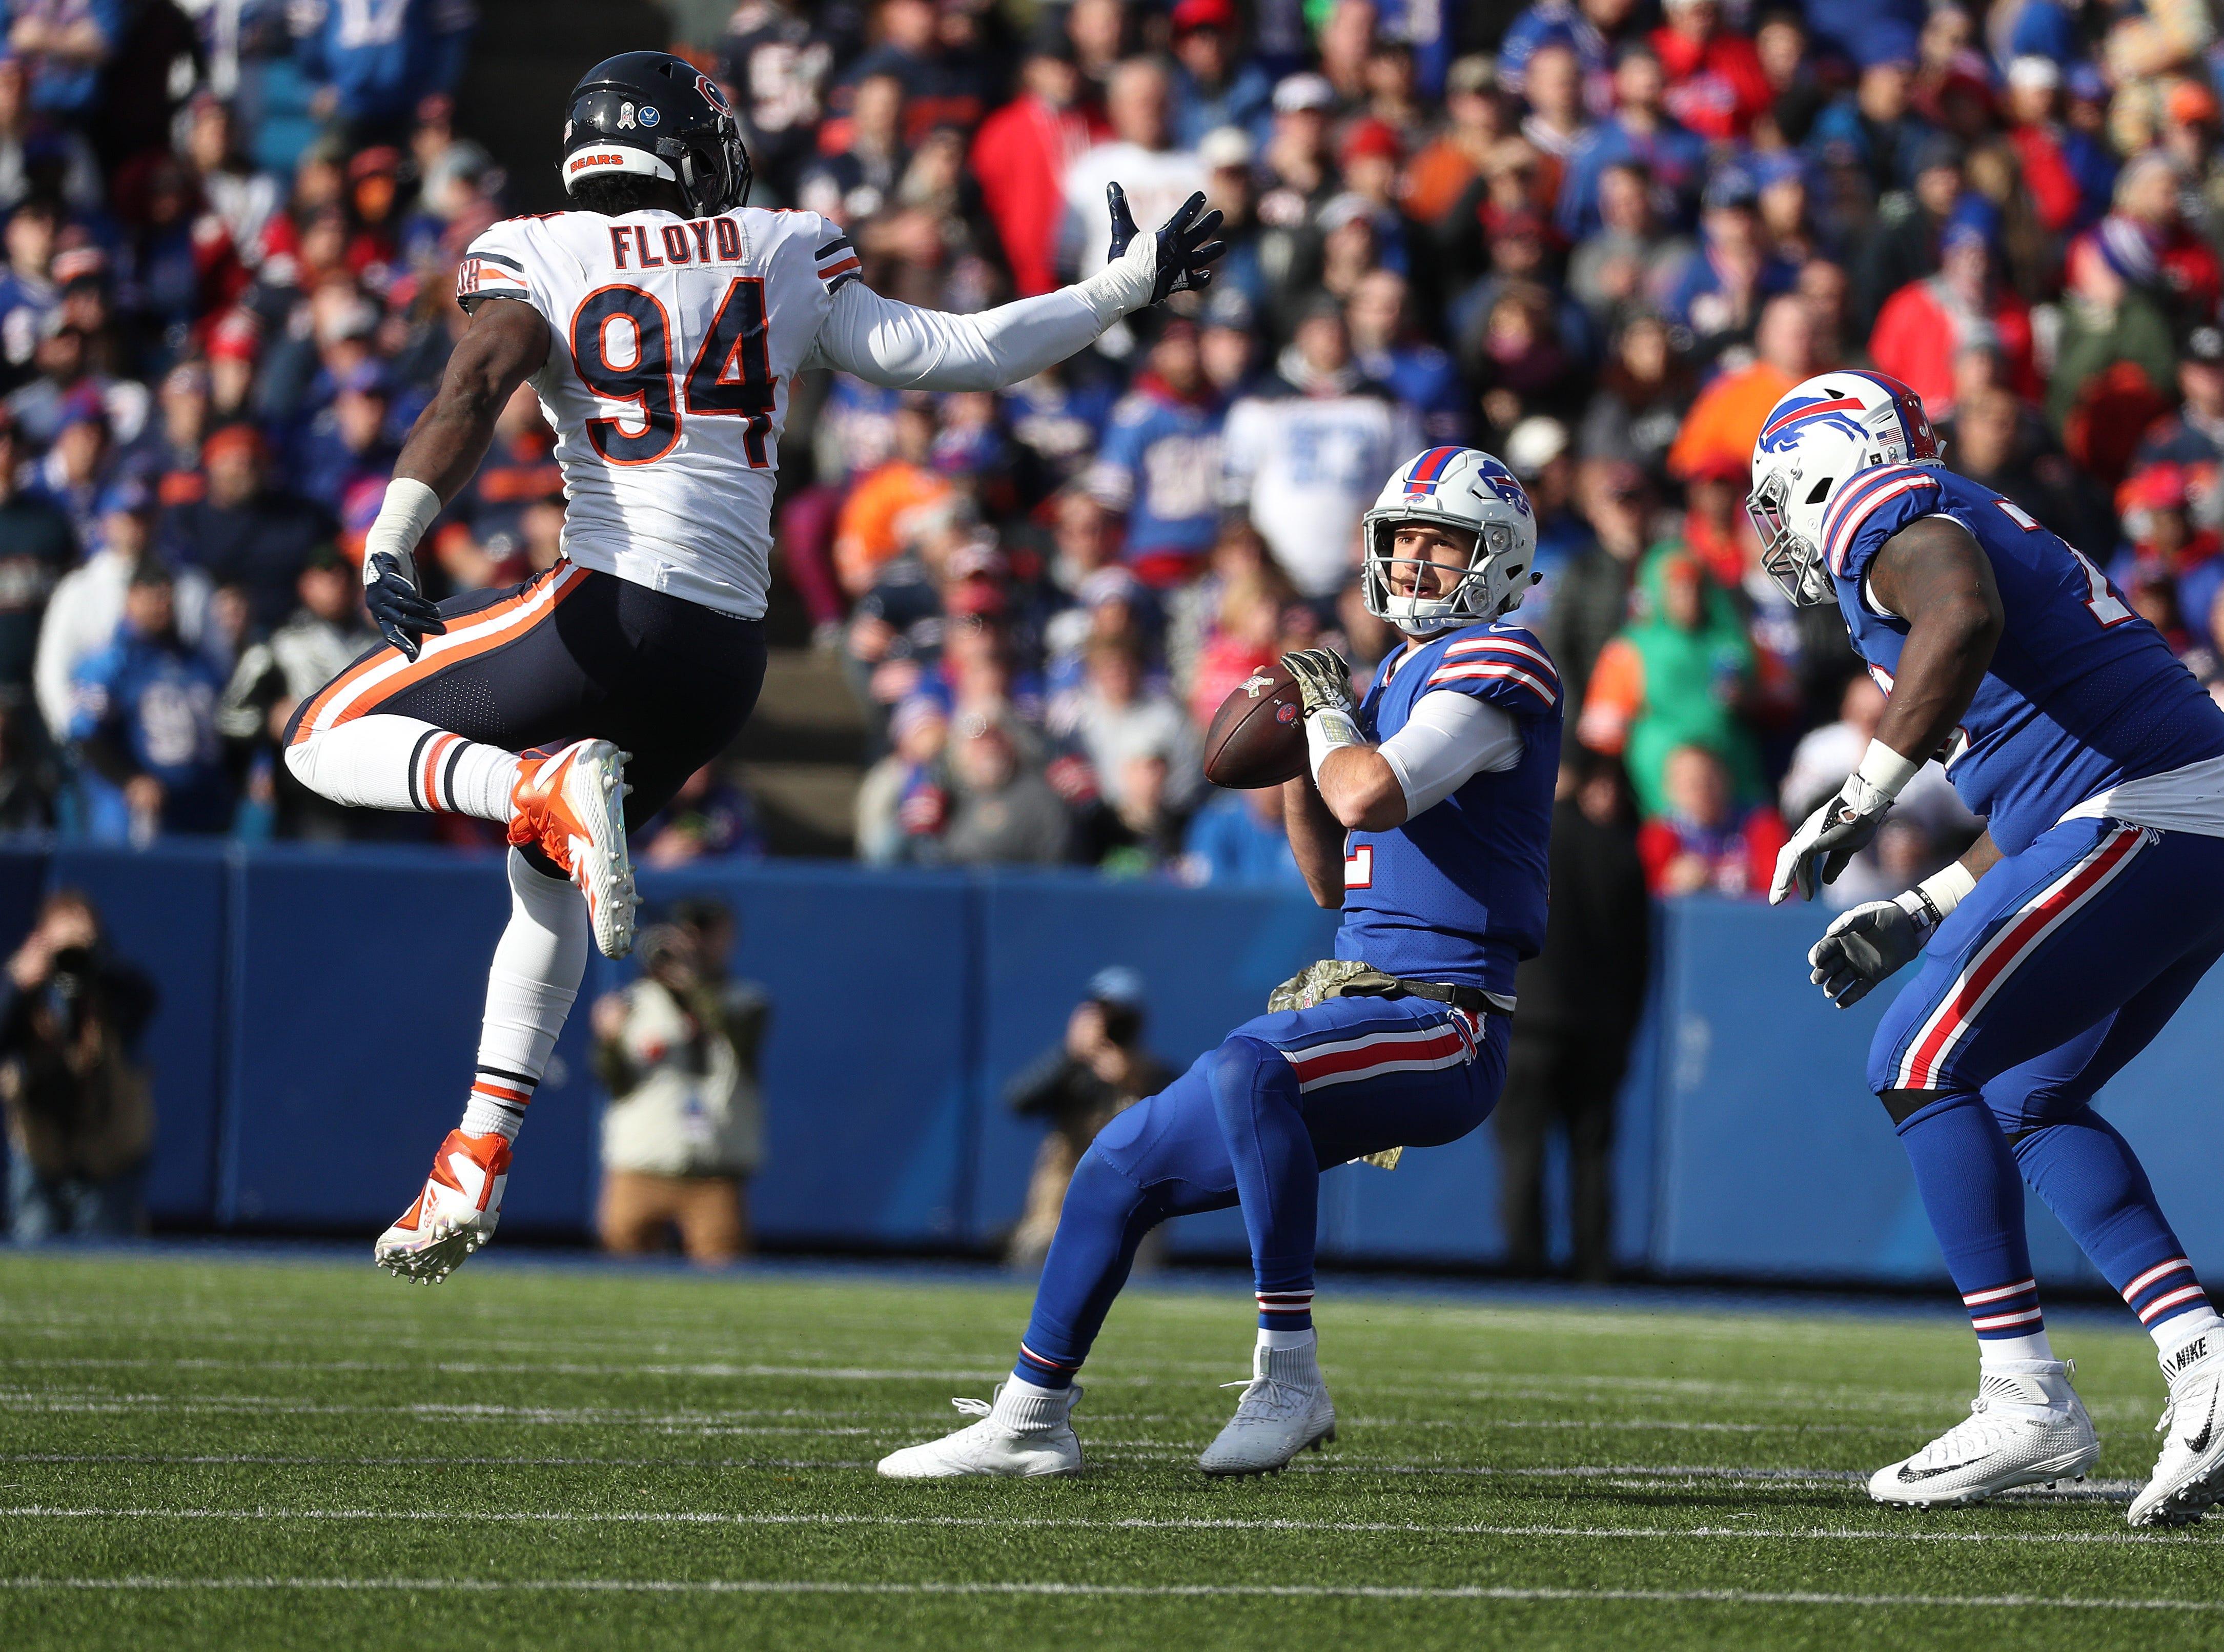 Final score and recap: Chicago Bears 41, Buffalo Bills 9